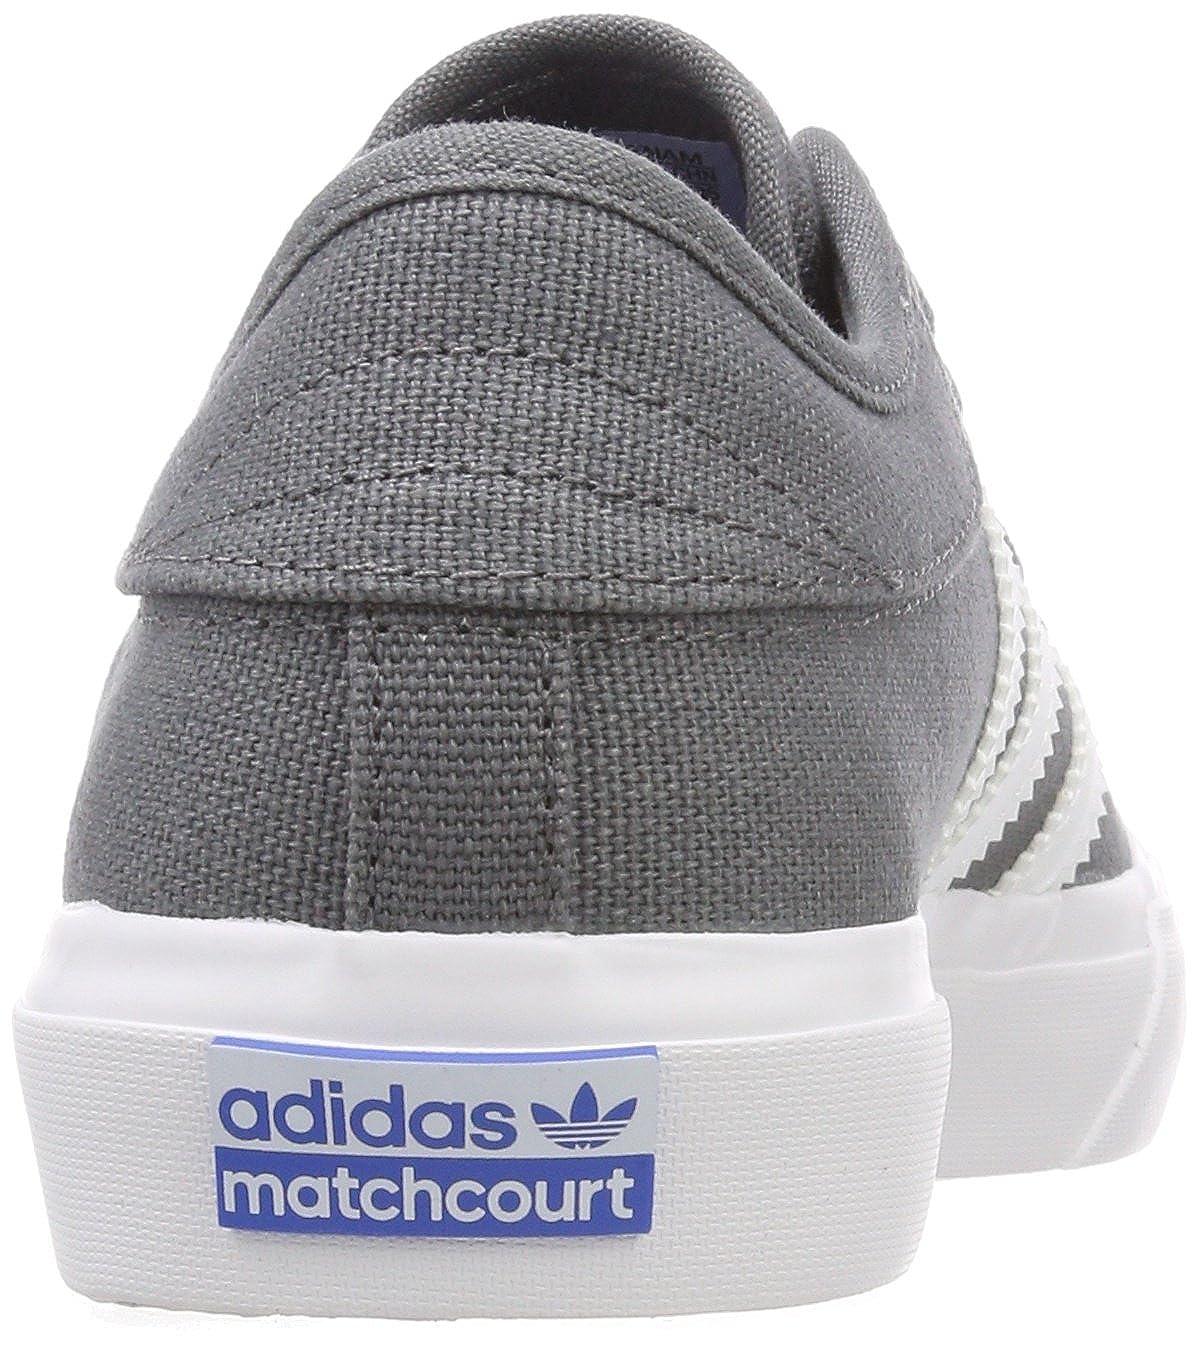 pretty nice c73c8 a536c adidas Matchcourt J, Scarpe da Skateboard Unisex - Bambini Amazon.it  Scarpe e borse